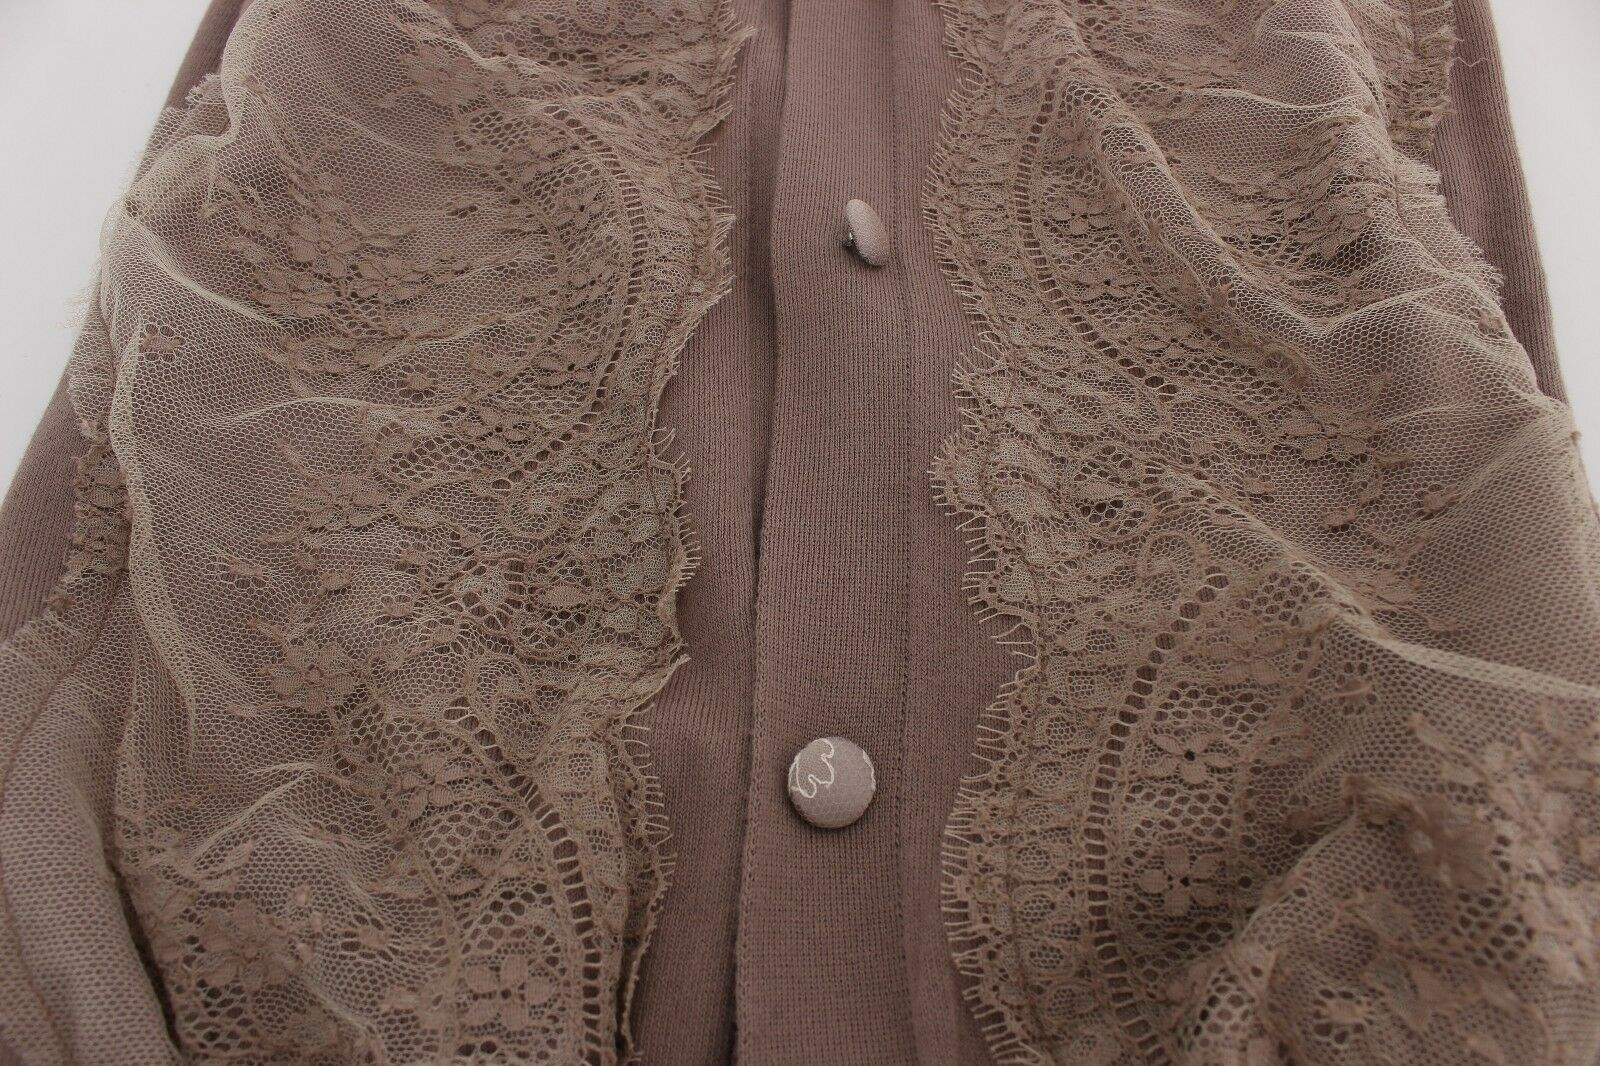 NEW  360 PINK MEMORIES Sweater Cardigan Purple Lace Lace Lace Cotton Top IT42   US8   M af7d73